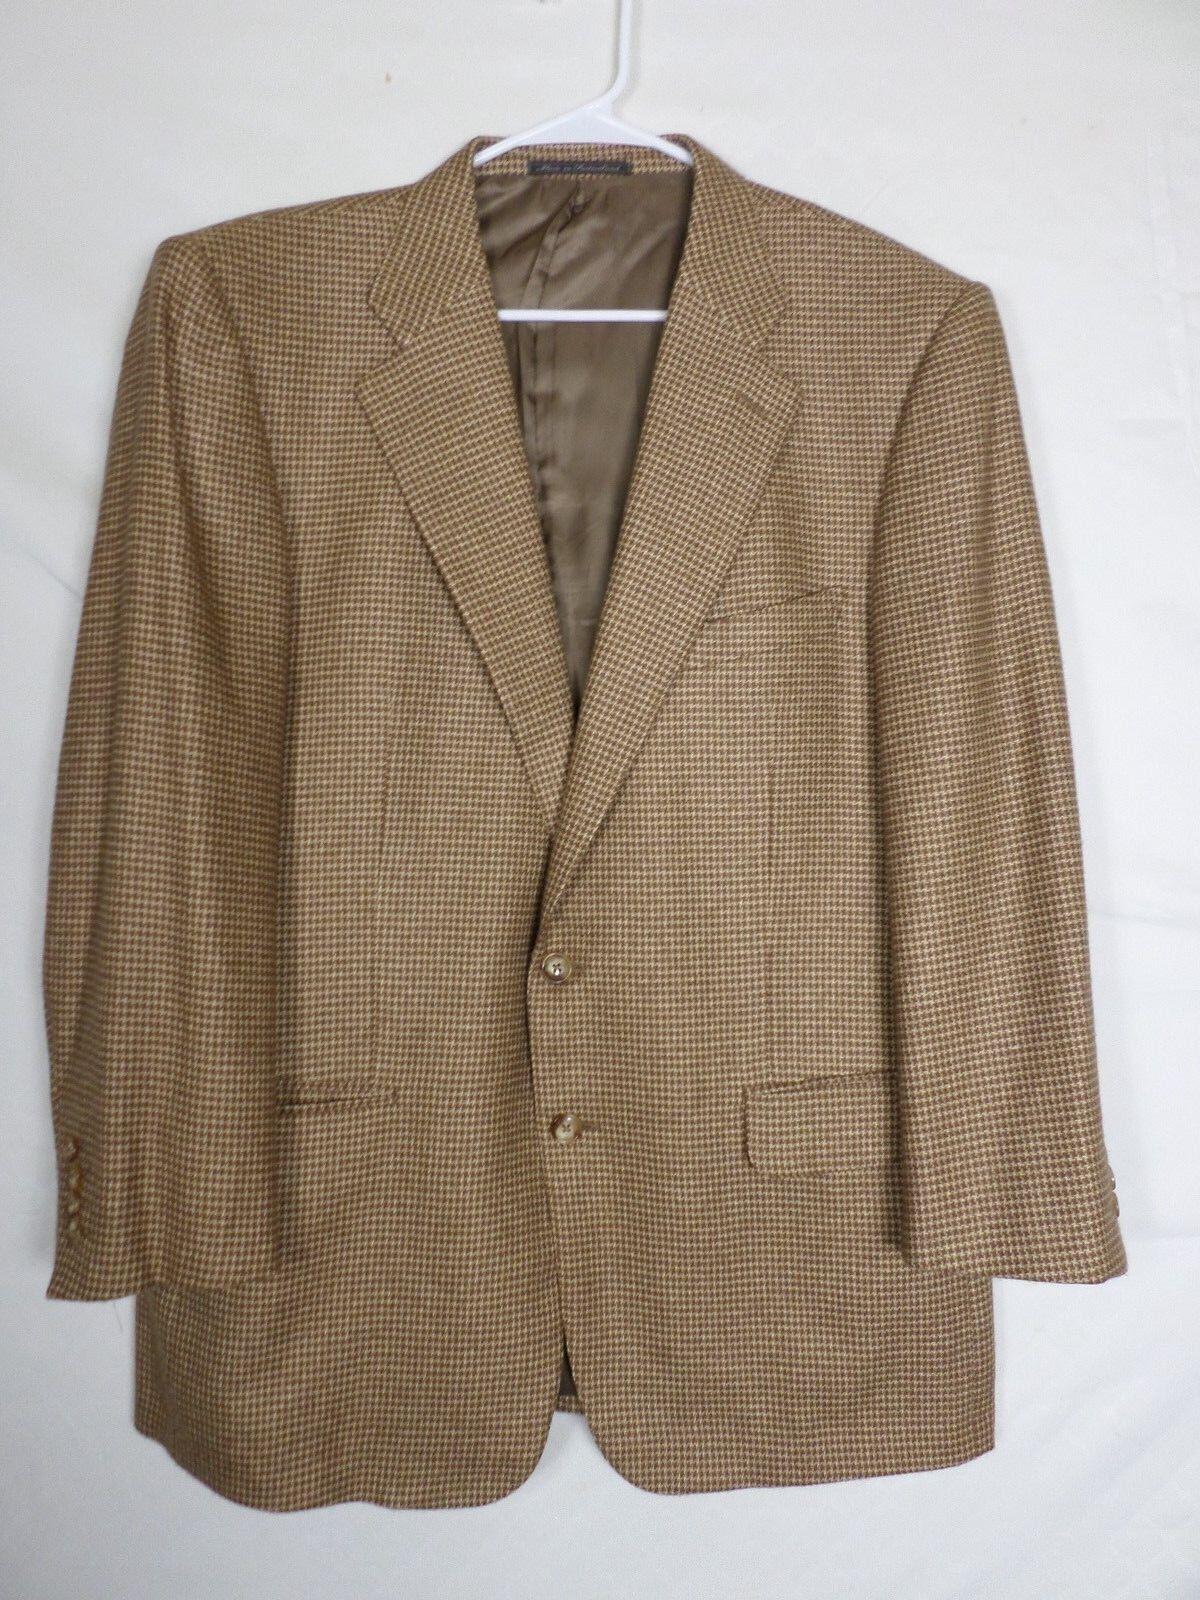 Ermenegildo Zegna Mens Sport Coat Blazer Size 42 Brown Two Button Silk Cashmere